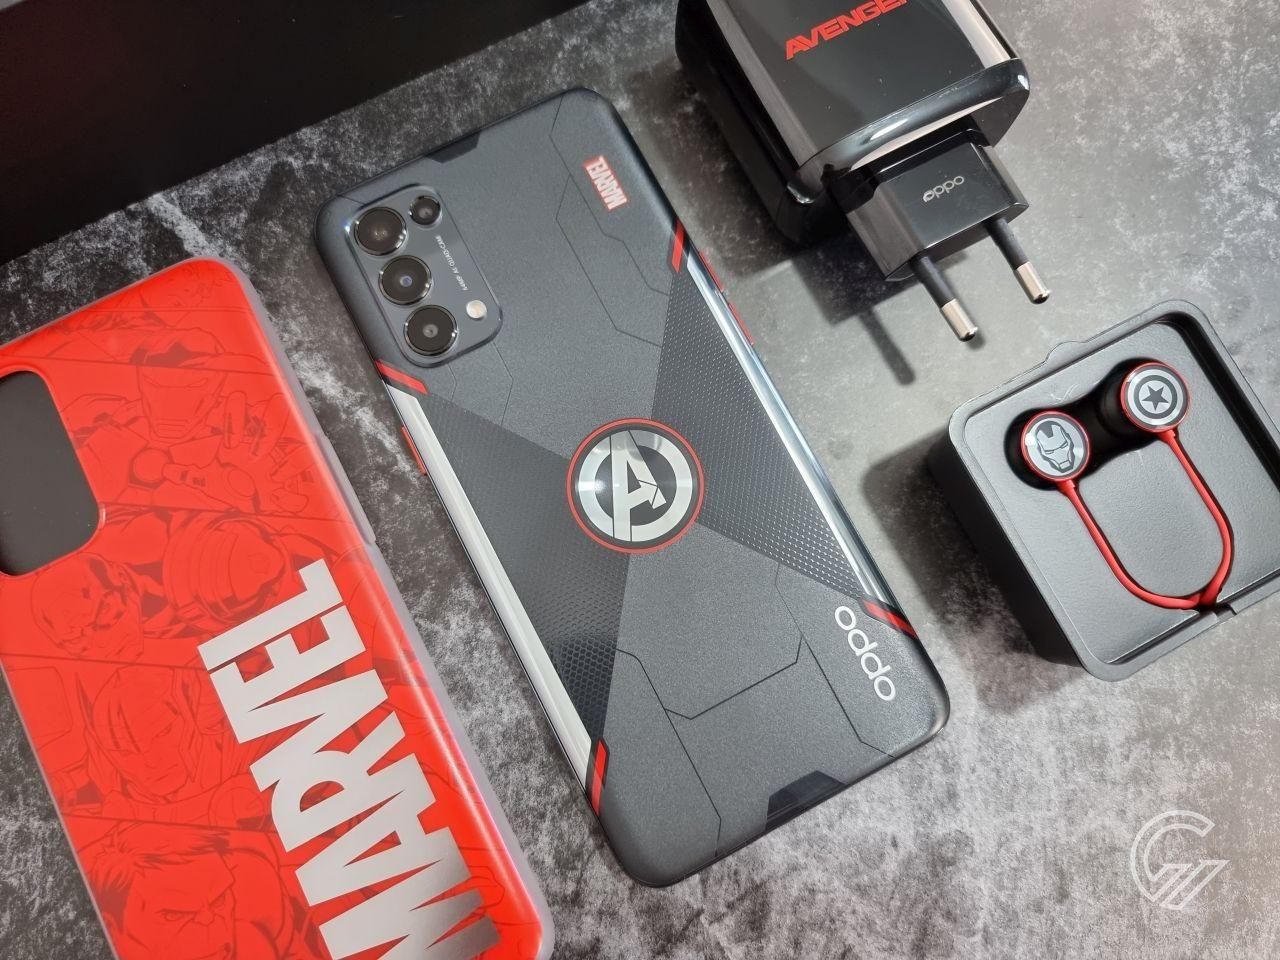 OPPO Reno5 Marvel Edition